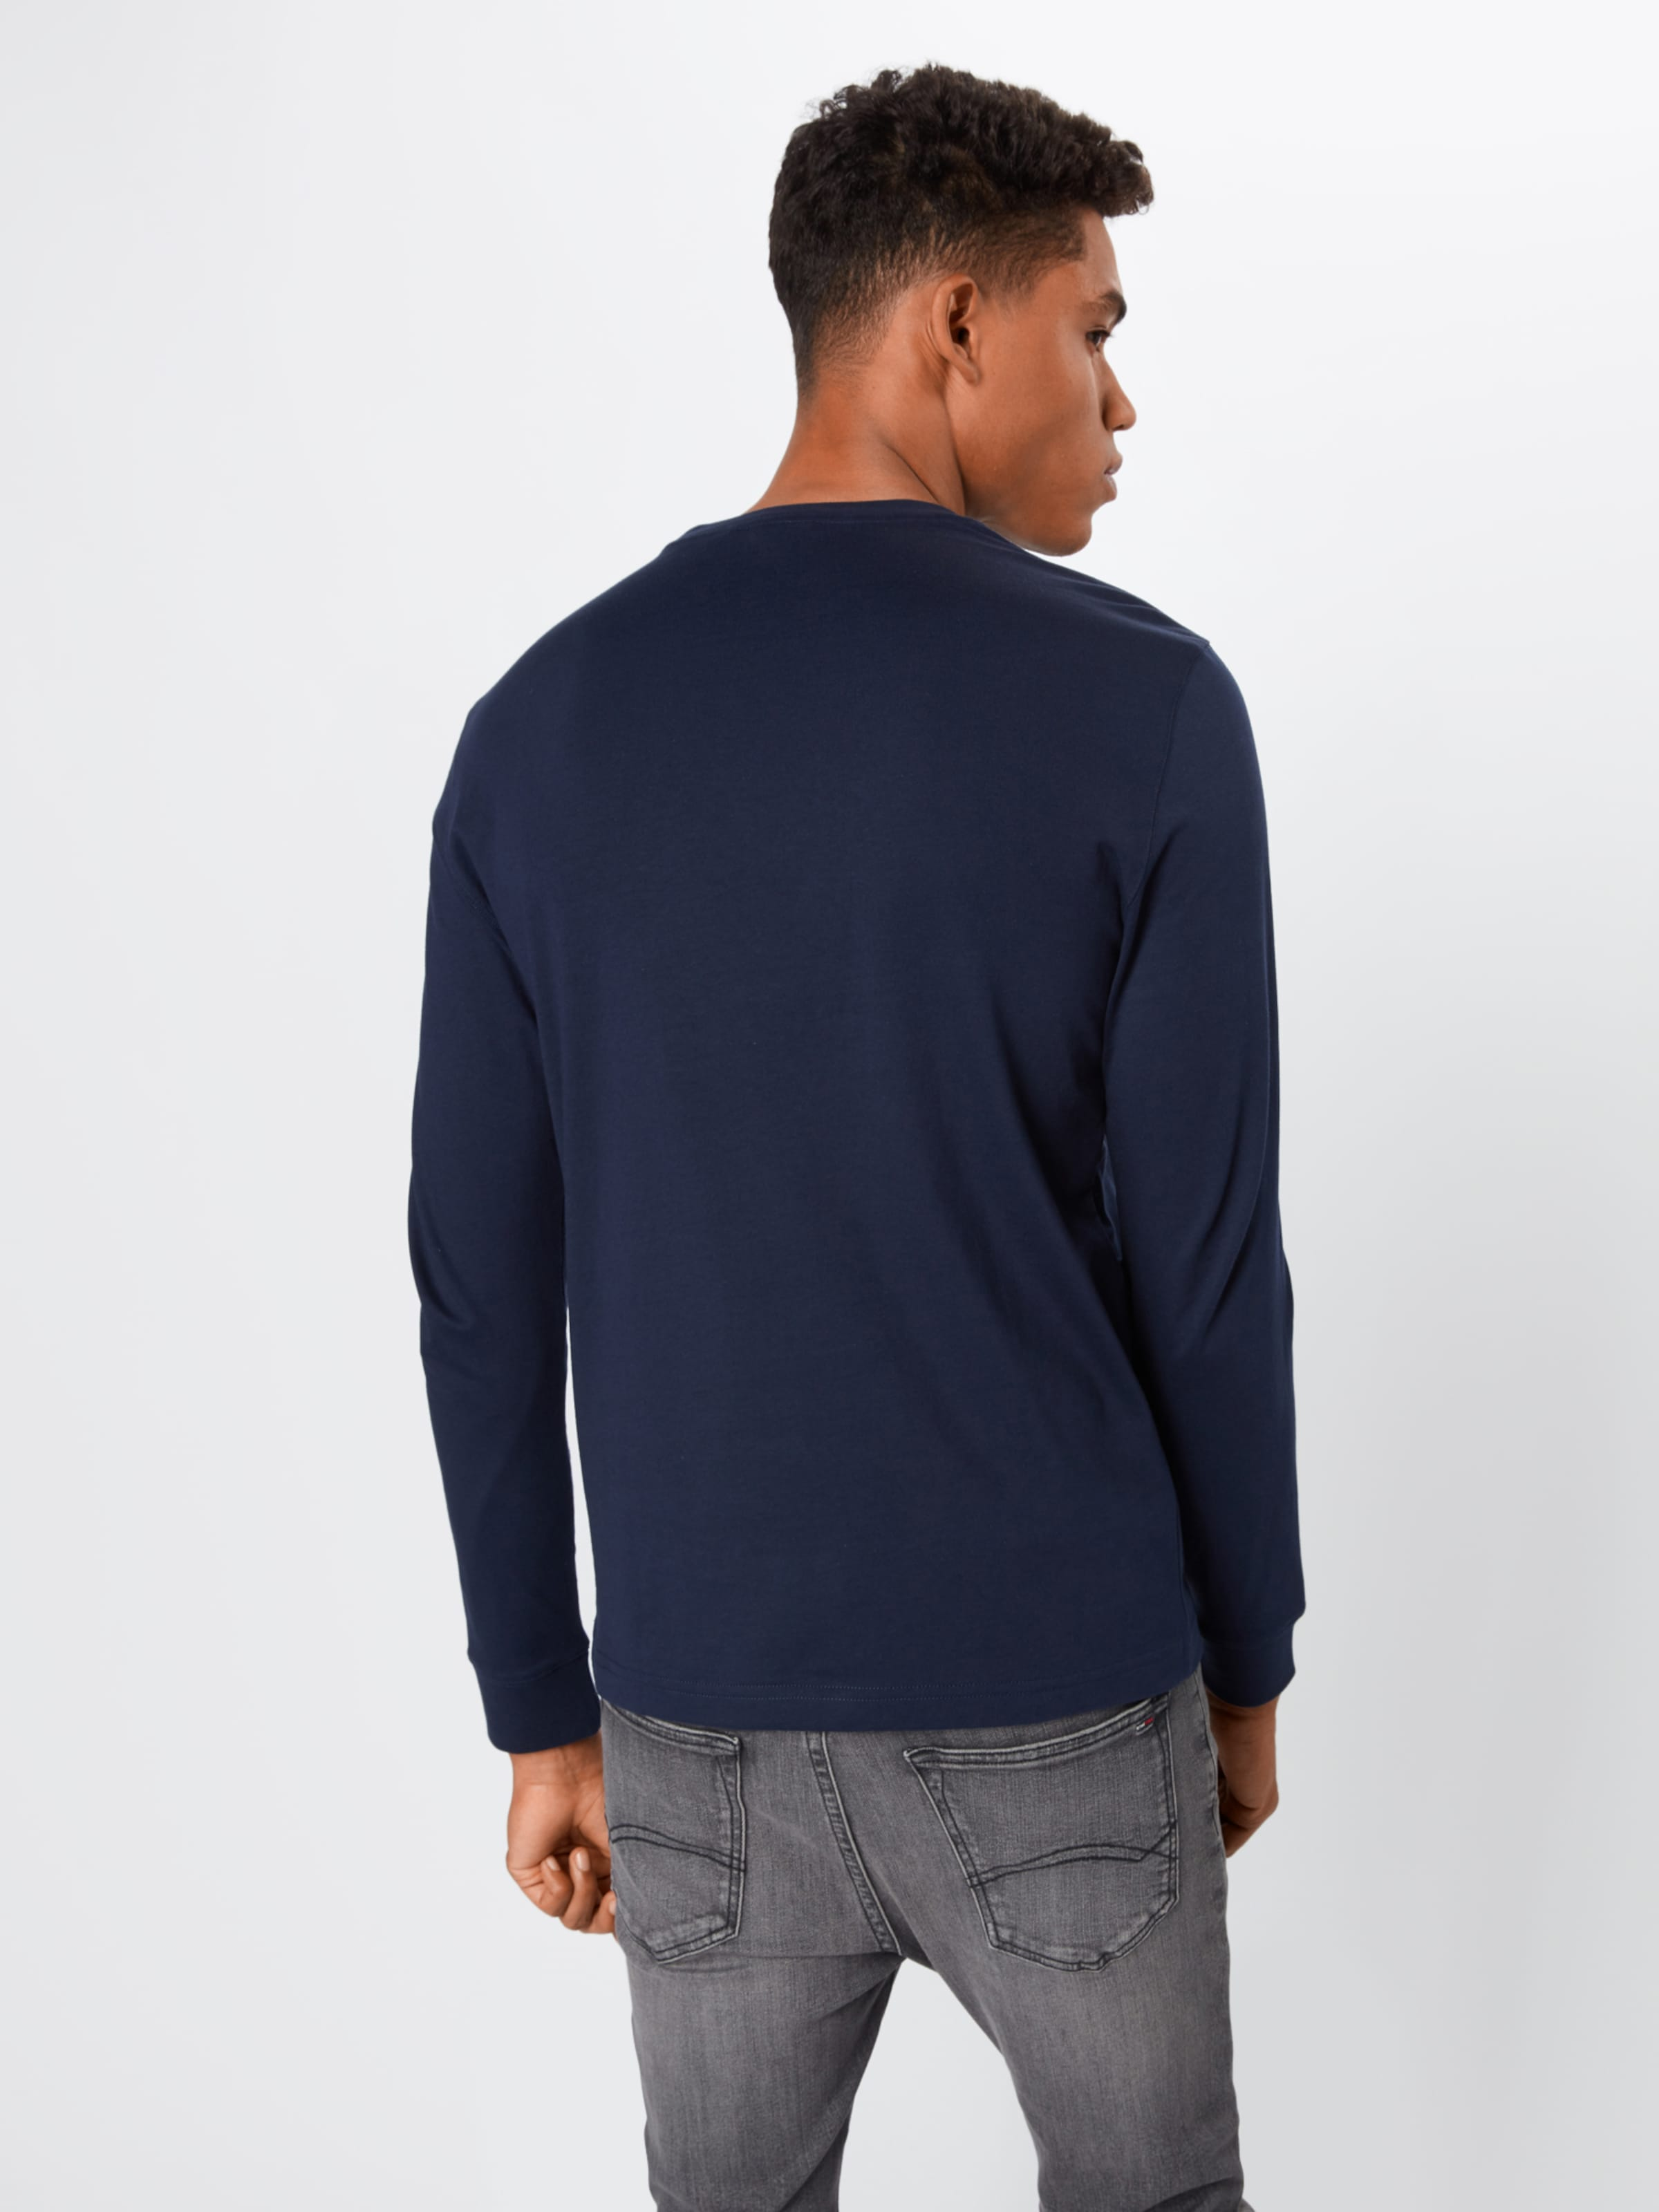 shirt T En Lacoste T En Marine shirt Lacoste Lacoste Marine T shirt En cAq534RjL